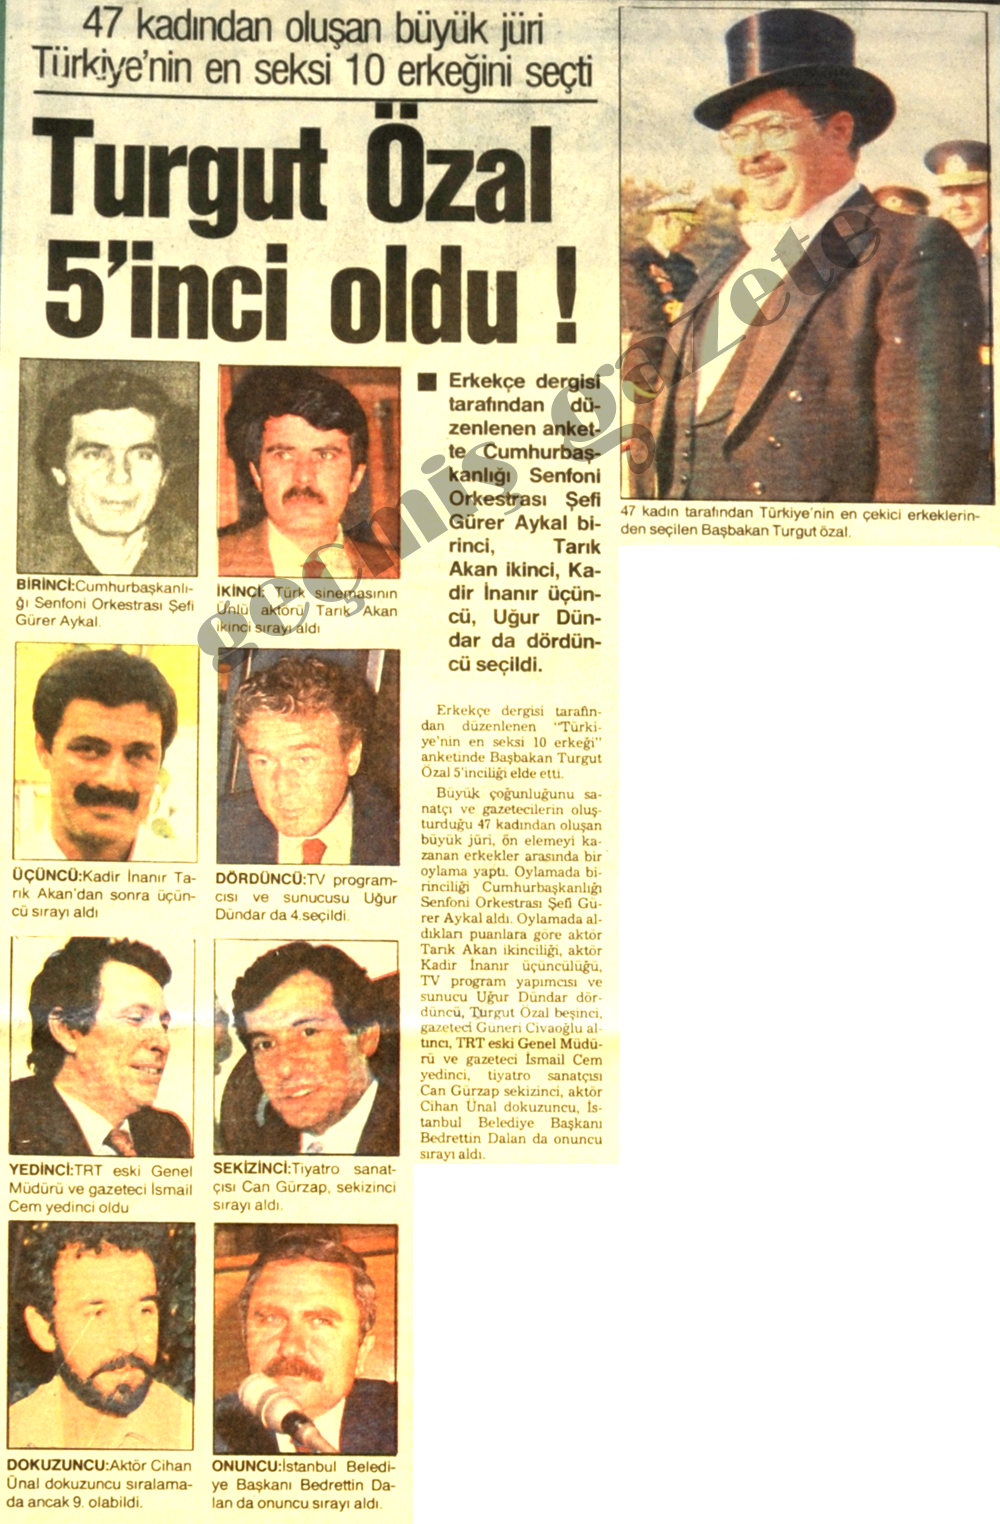 Turgut Özal 5'inci oldu!